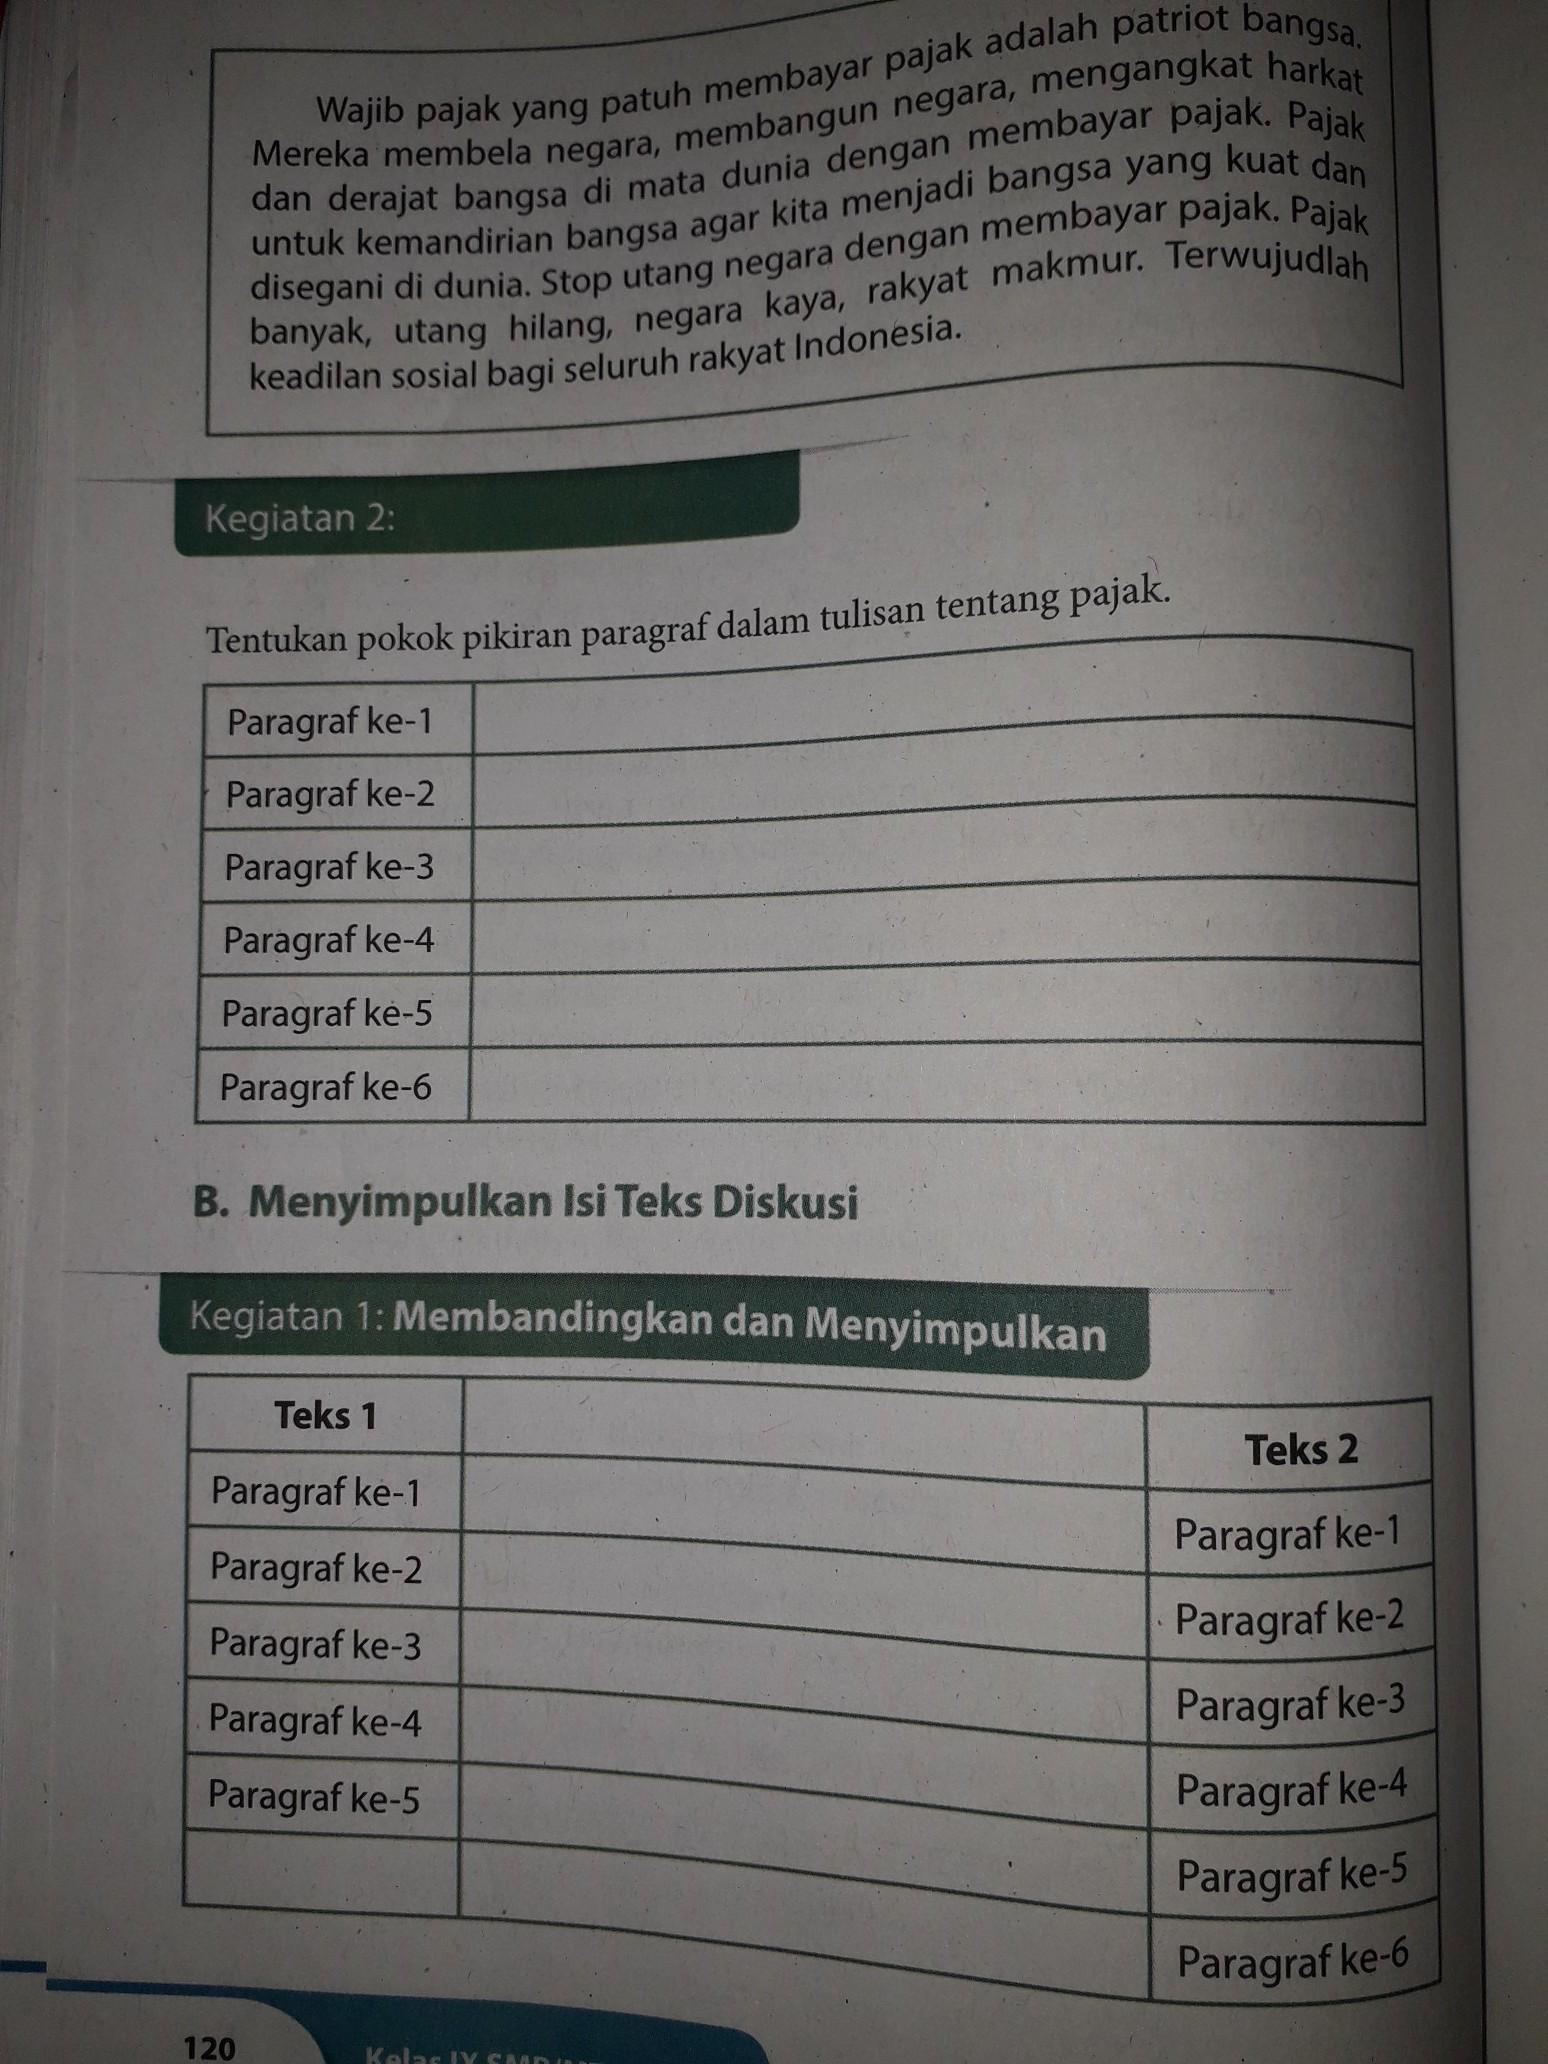 Soal Bahasa Indonesia Kelas 9 Semester 2 Dan Kunci Jawaban Kurikulum 2013 : bahasa, indonesia, kelas, semester, kunci, jawaban, kurikulum, Jawaban, Bahasa, Indonesia, Kelas, Halaman, Brainly.co.id